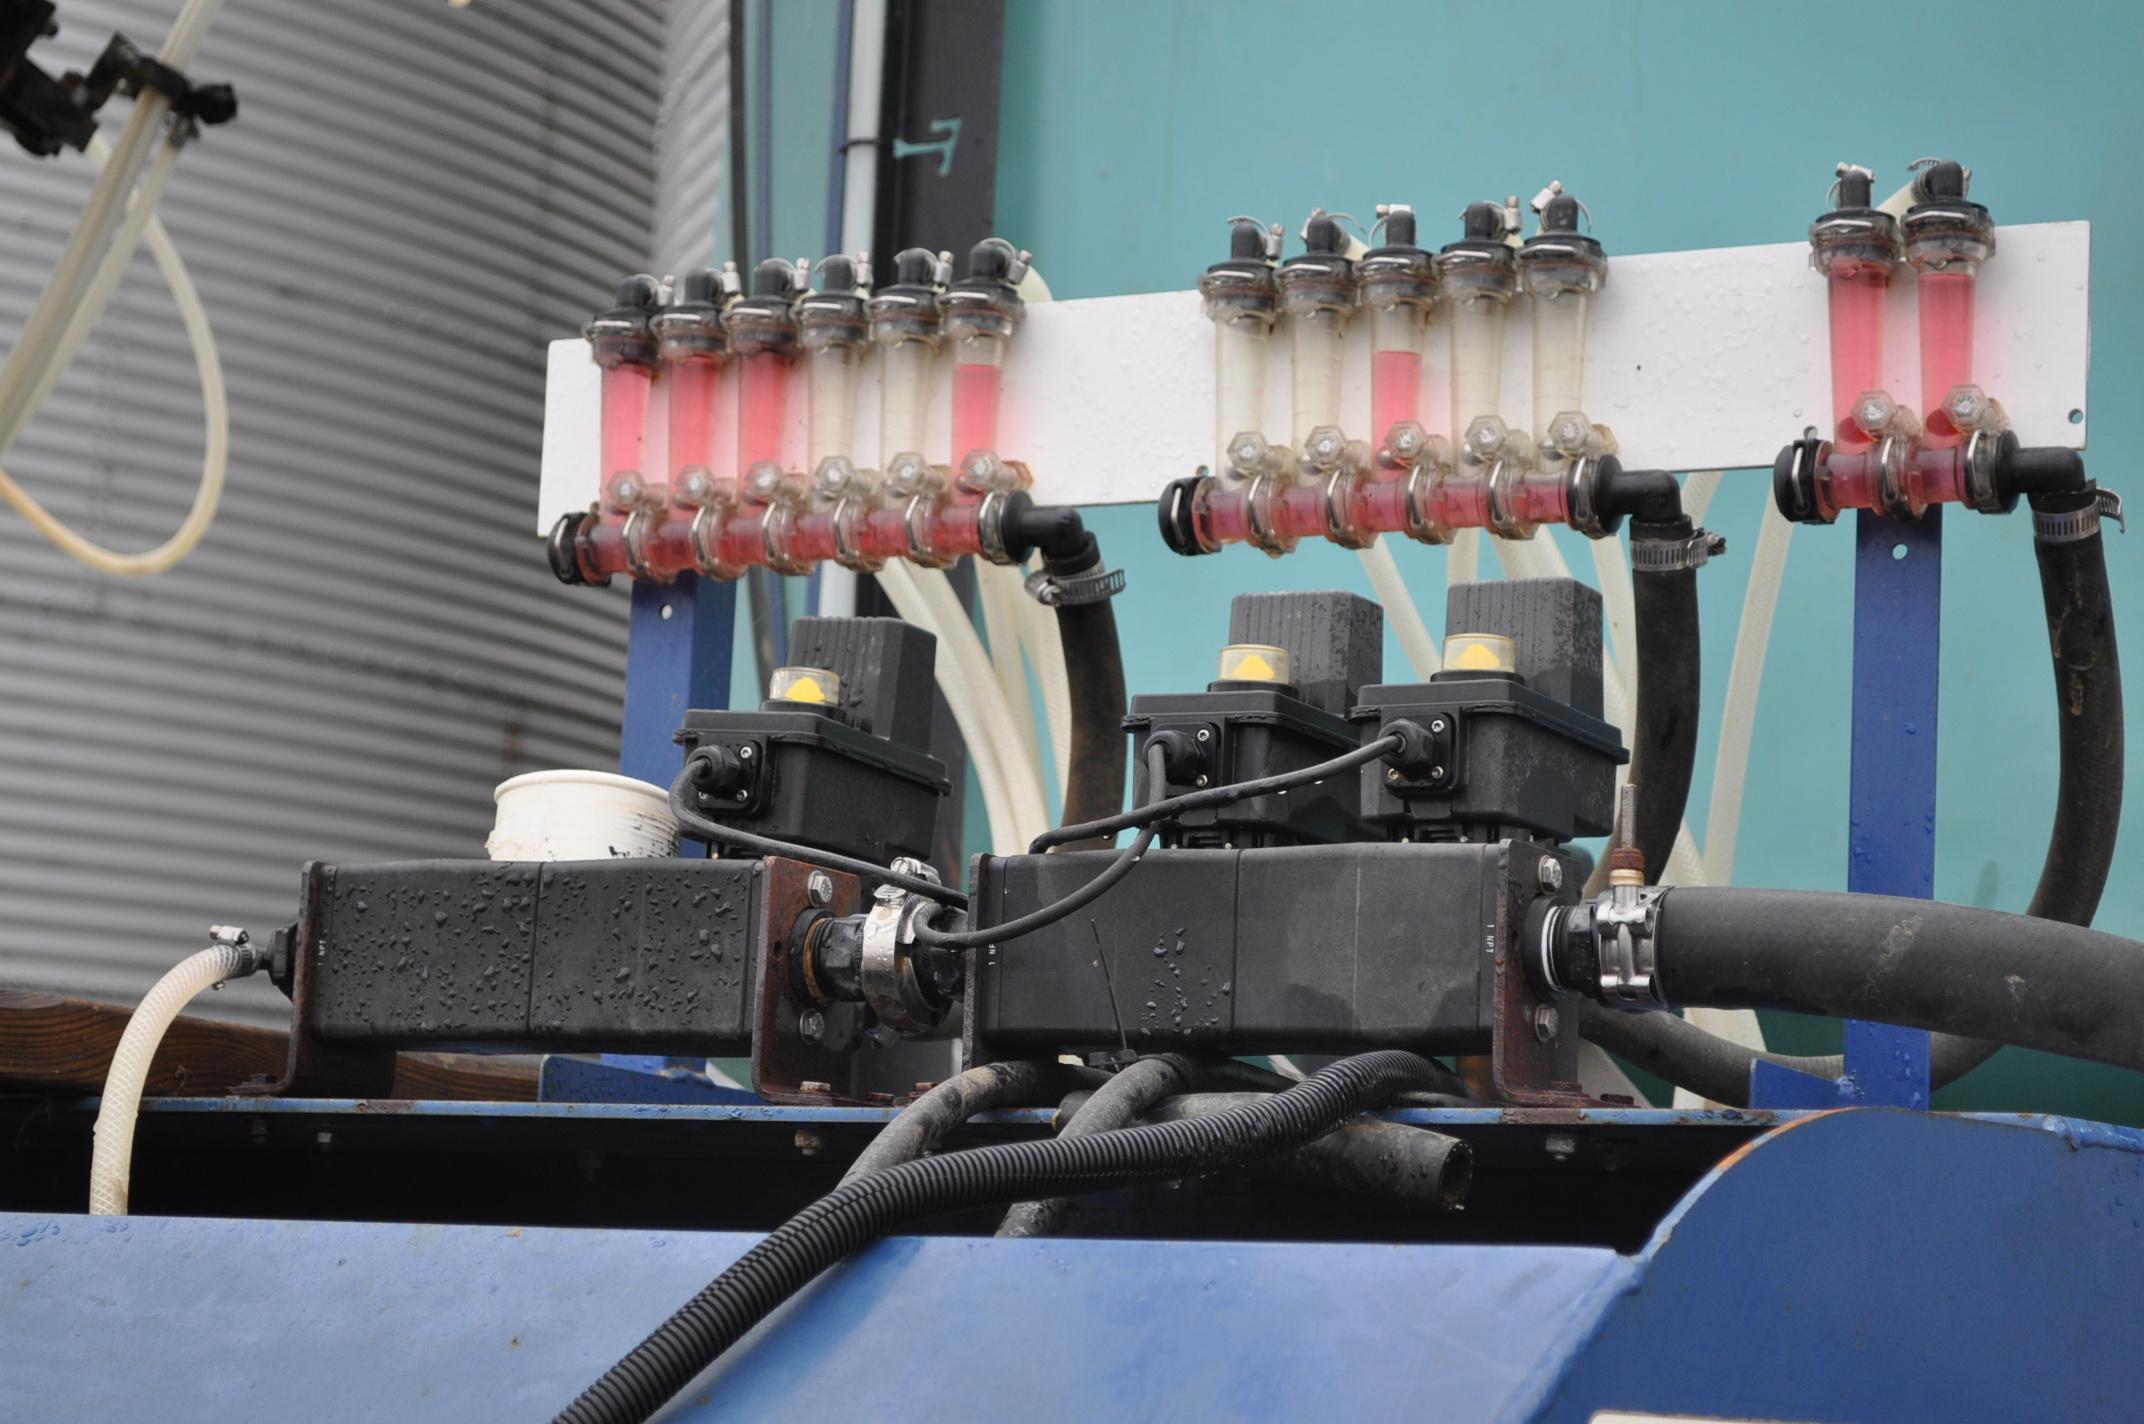 Blu-Jet AT 4010 28% applicator, 12/16 row, 1200 gal poly tank, 320/90R46 tires, hyd drive pump, - Image 9 of 12